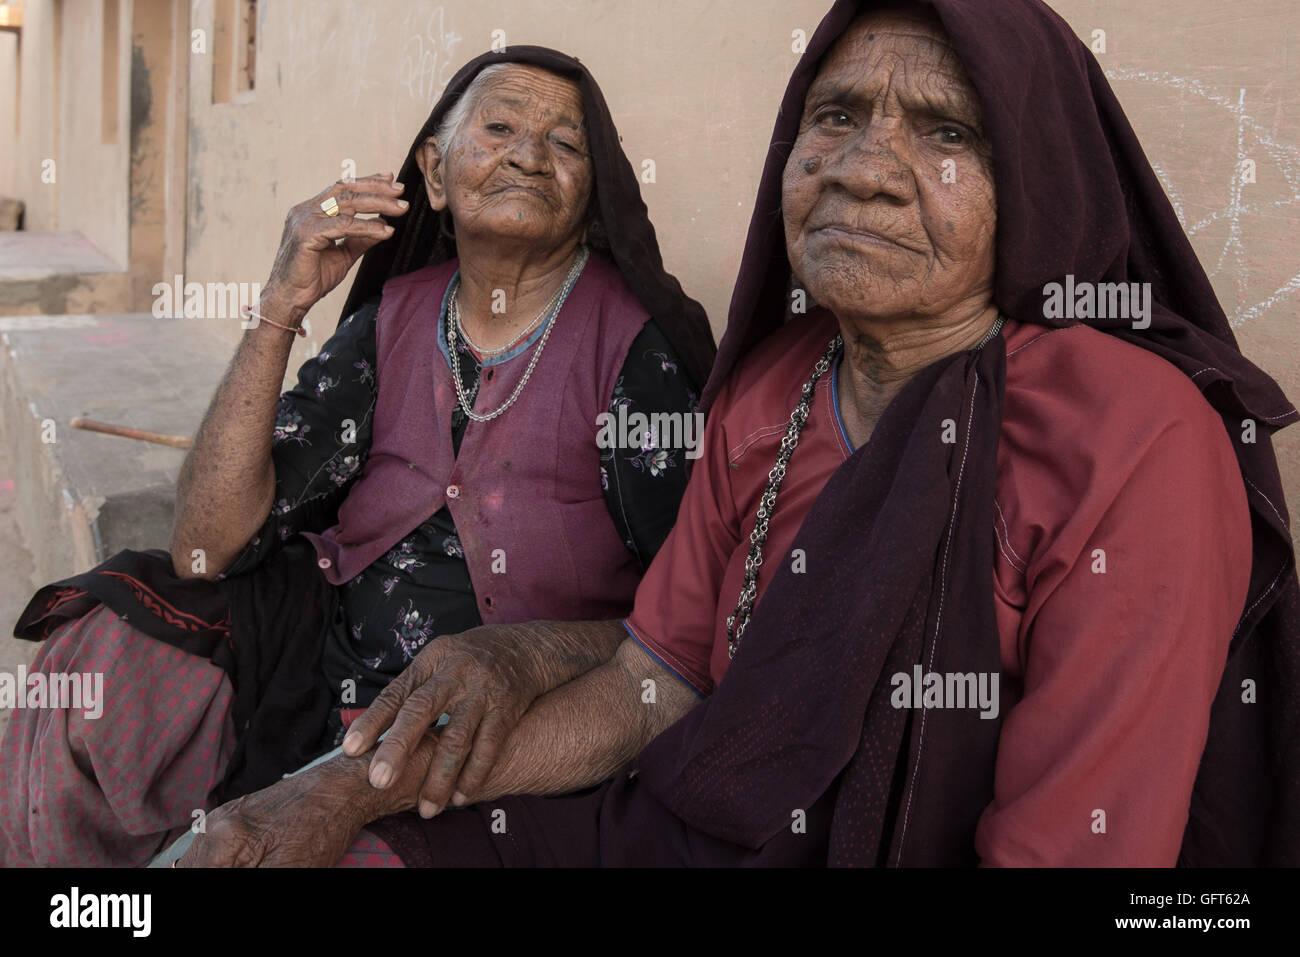 Elderly village women posing in the afternoon heat. Bhujodi, Bhuj Area, Kutch, Gujarat, India. - Stock Image